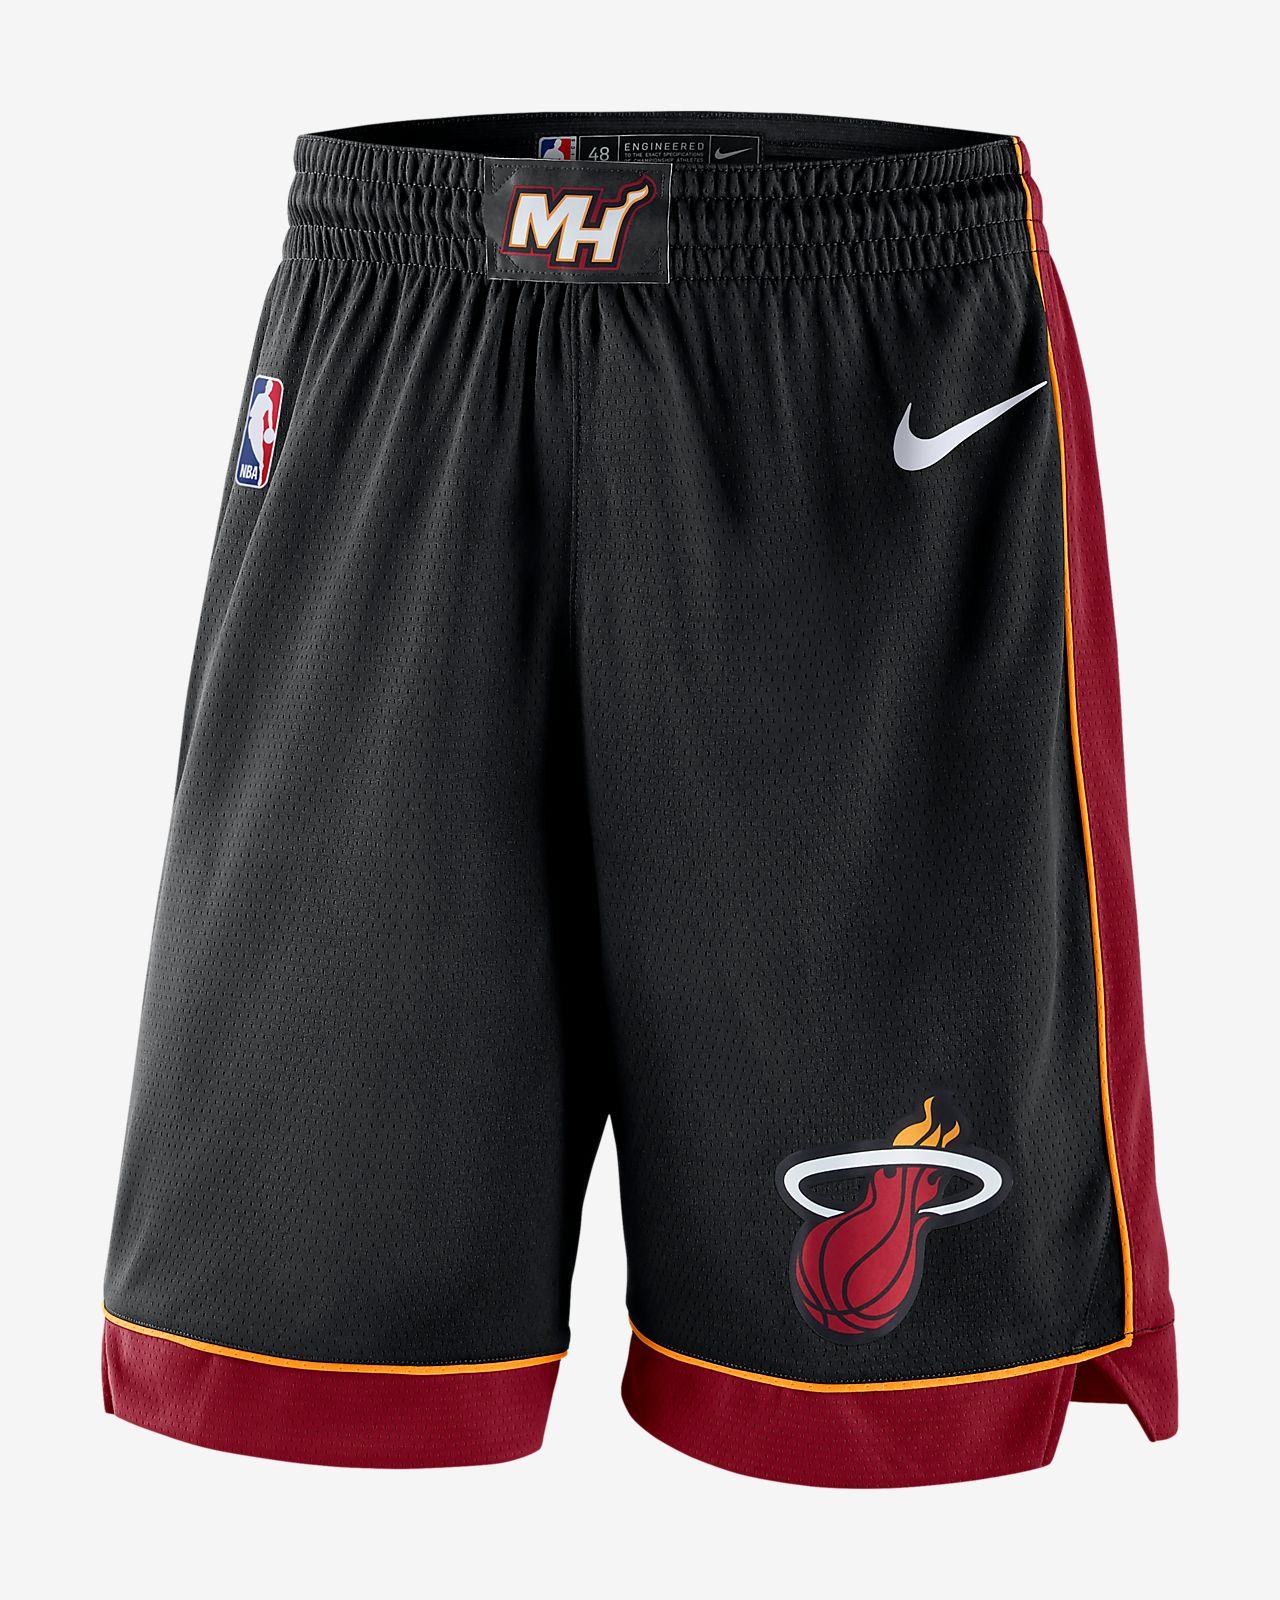 Miami Heat Nike Icon Edition Swingman NBA-s férfi rövidnadrág